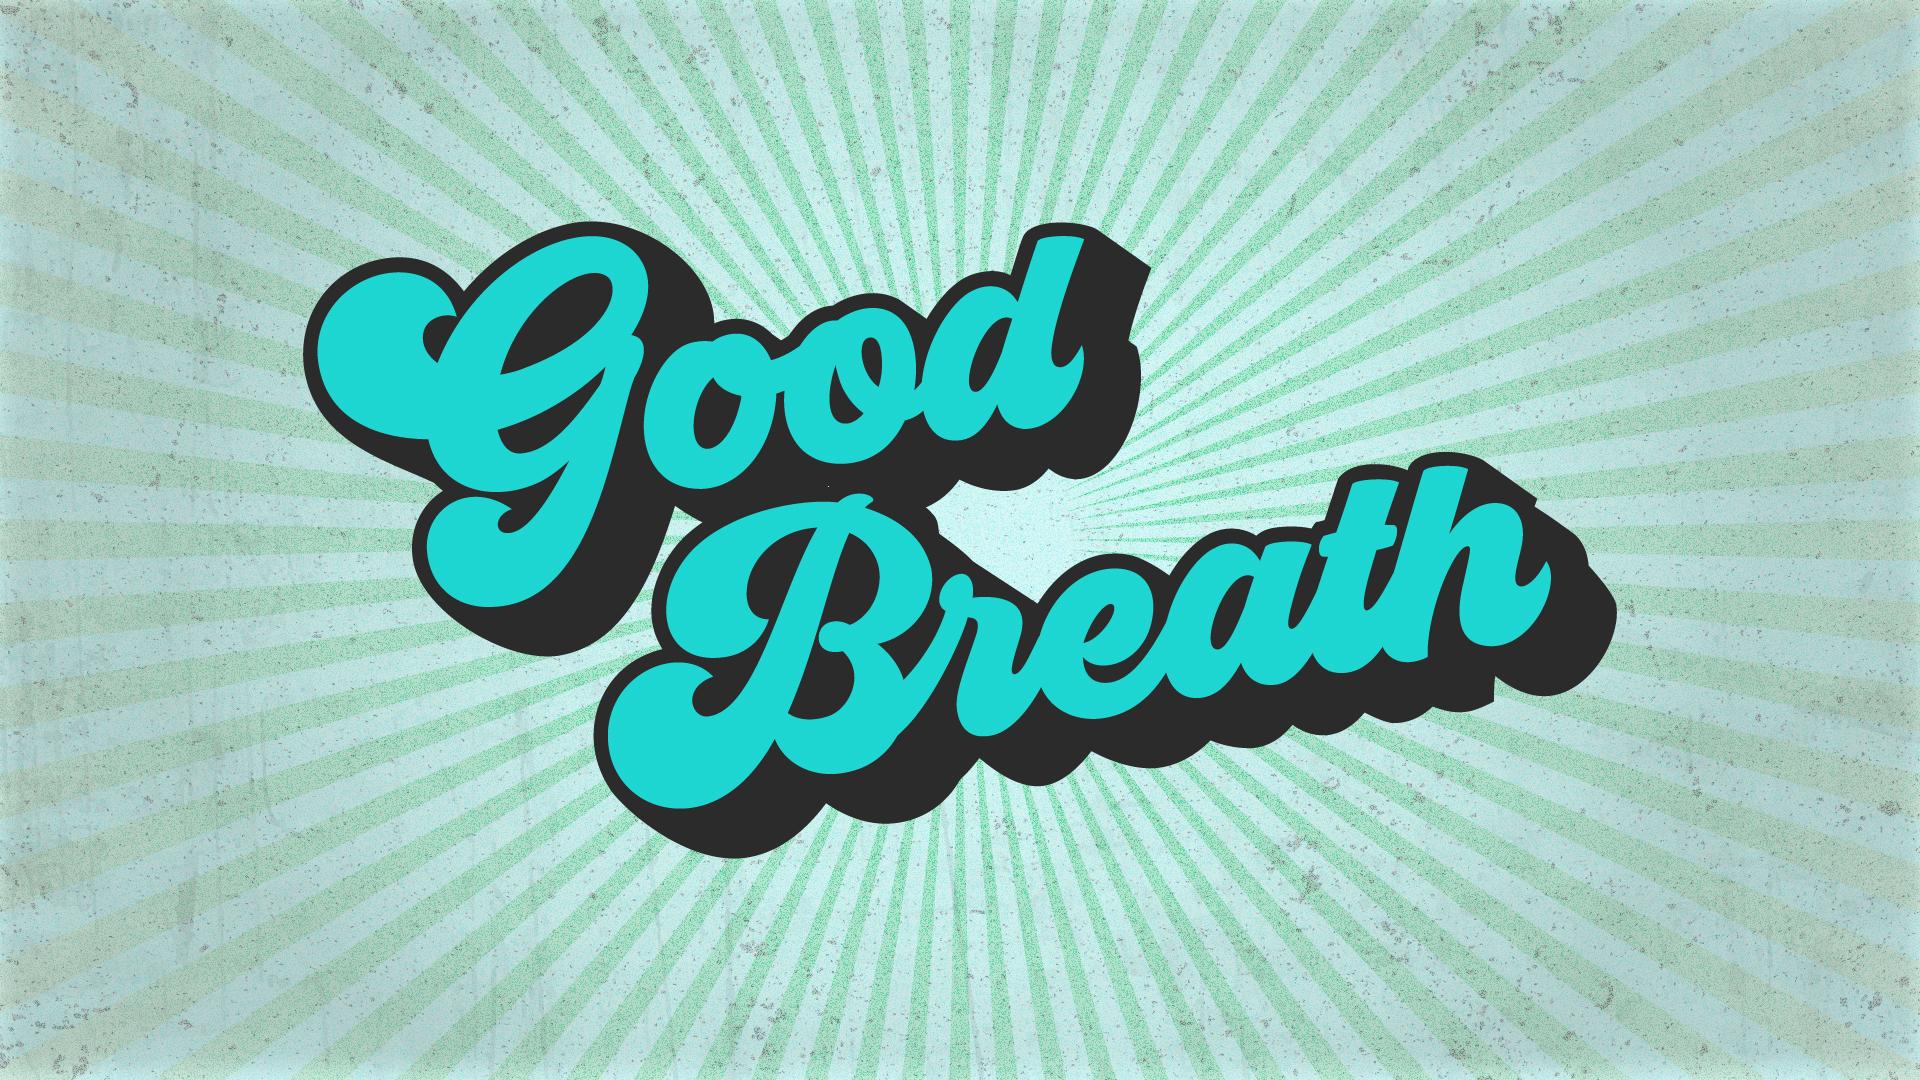 Good Breath 2-01-01.jpg